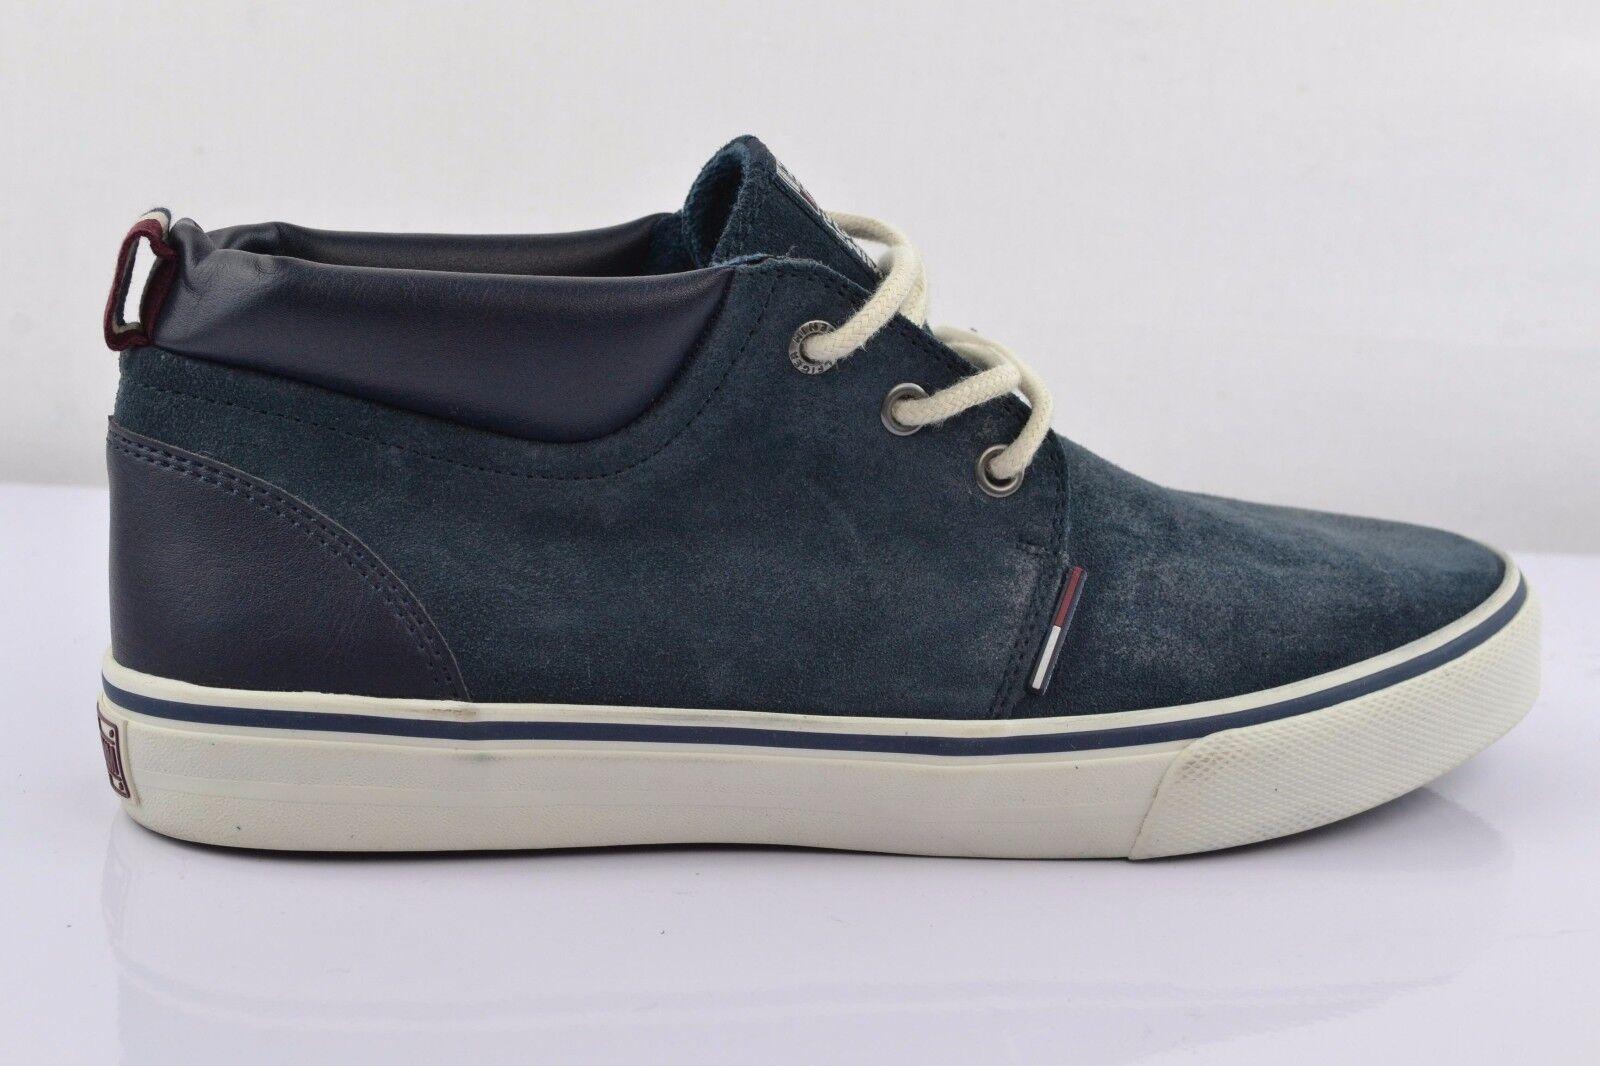 Tommy Hilfiger Vic 5B Blau Blue Schuhe Shoes Sneaker Gr. 42 Herren Man